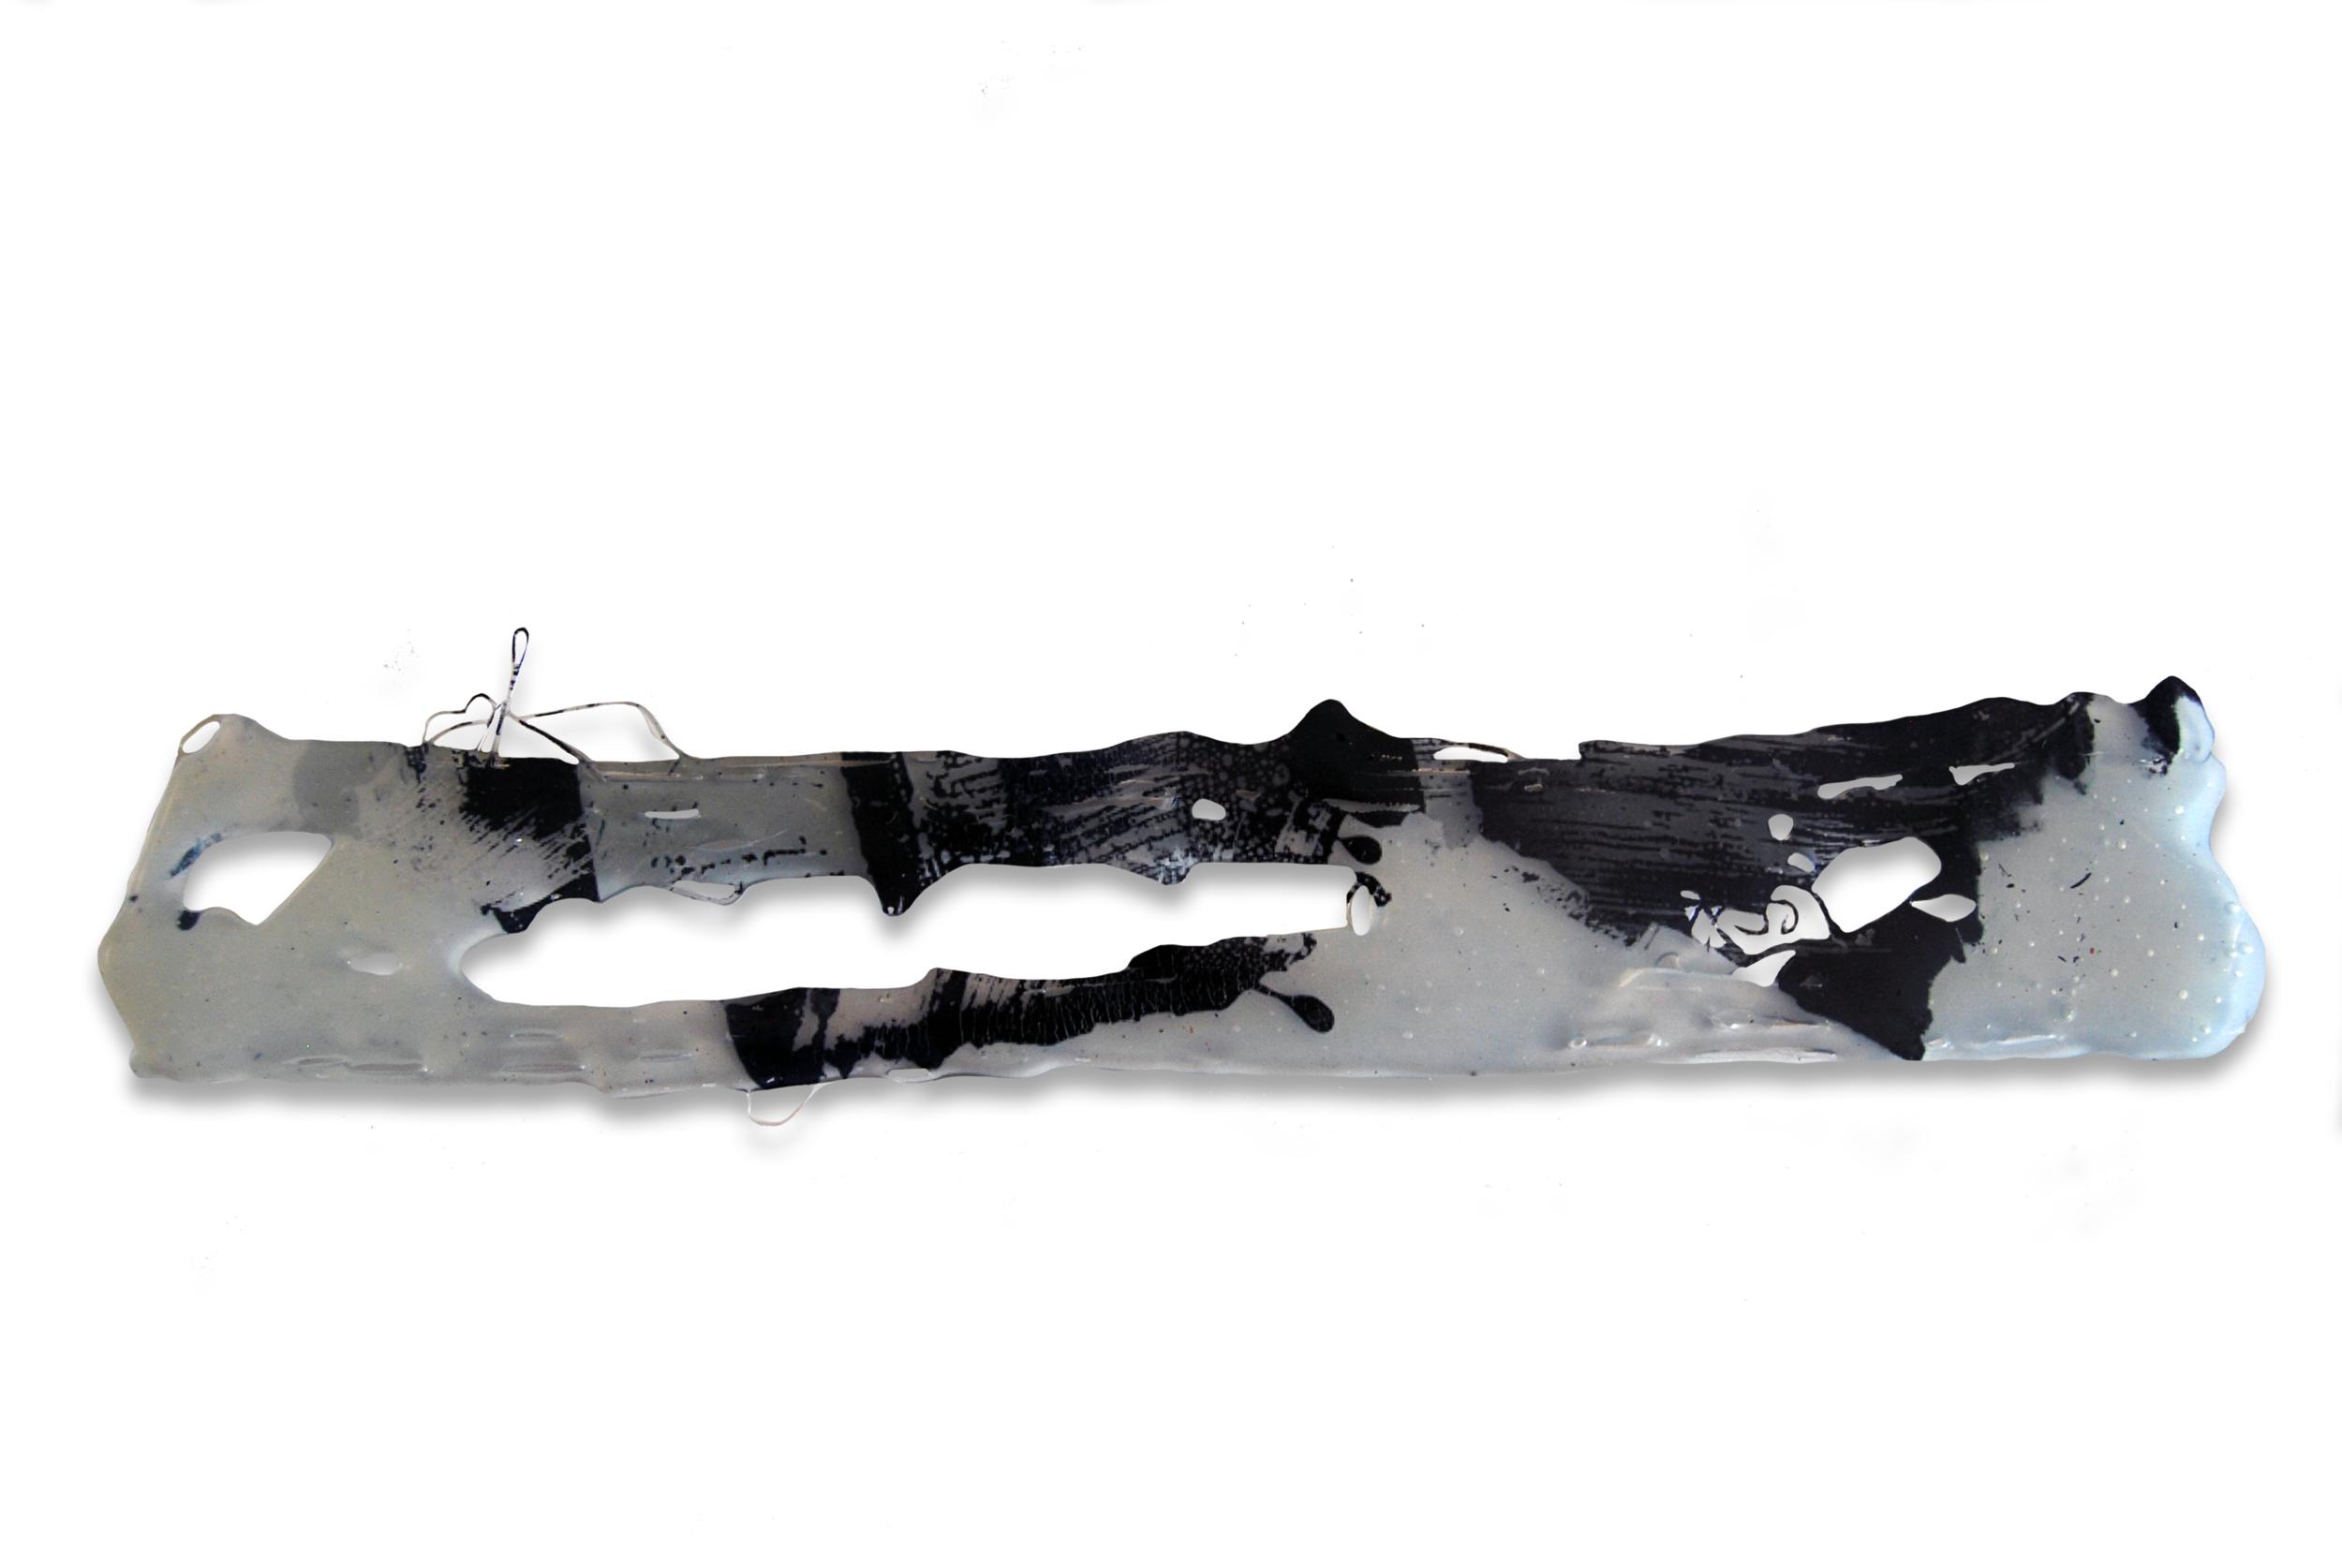 Transfer nº7, 2015, Transferencia Digital sobre cola Termofusible. 7 x 39 cm